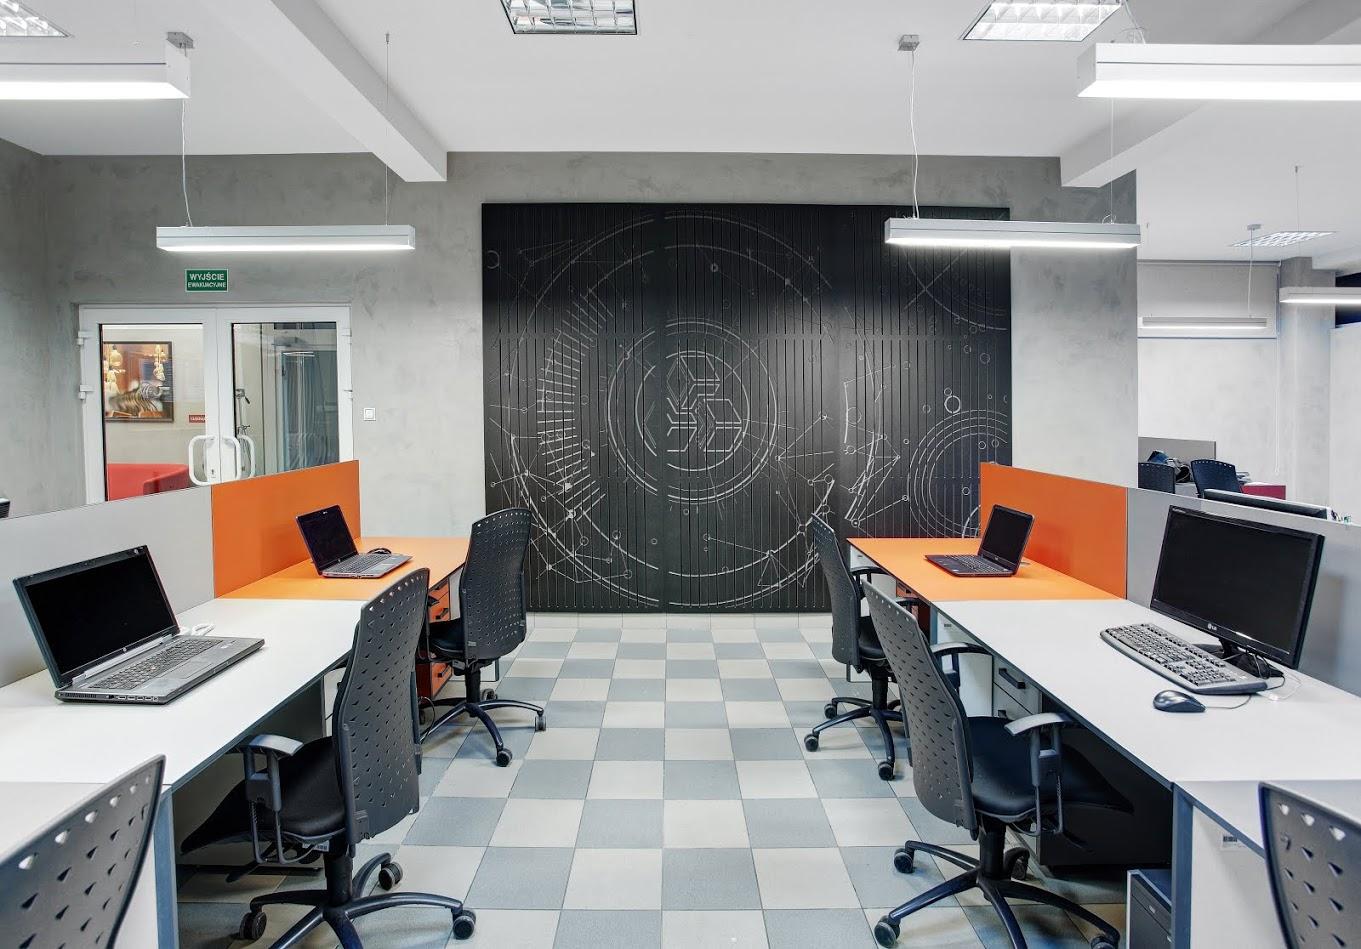 beton na scianach we wnetrzu biura.jpg